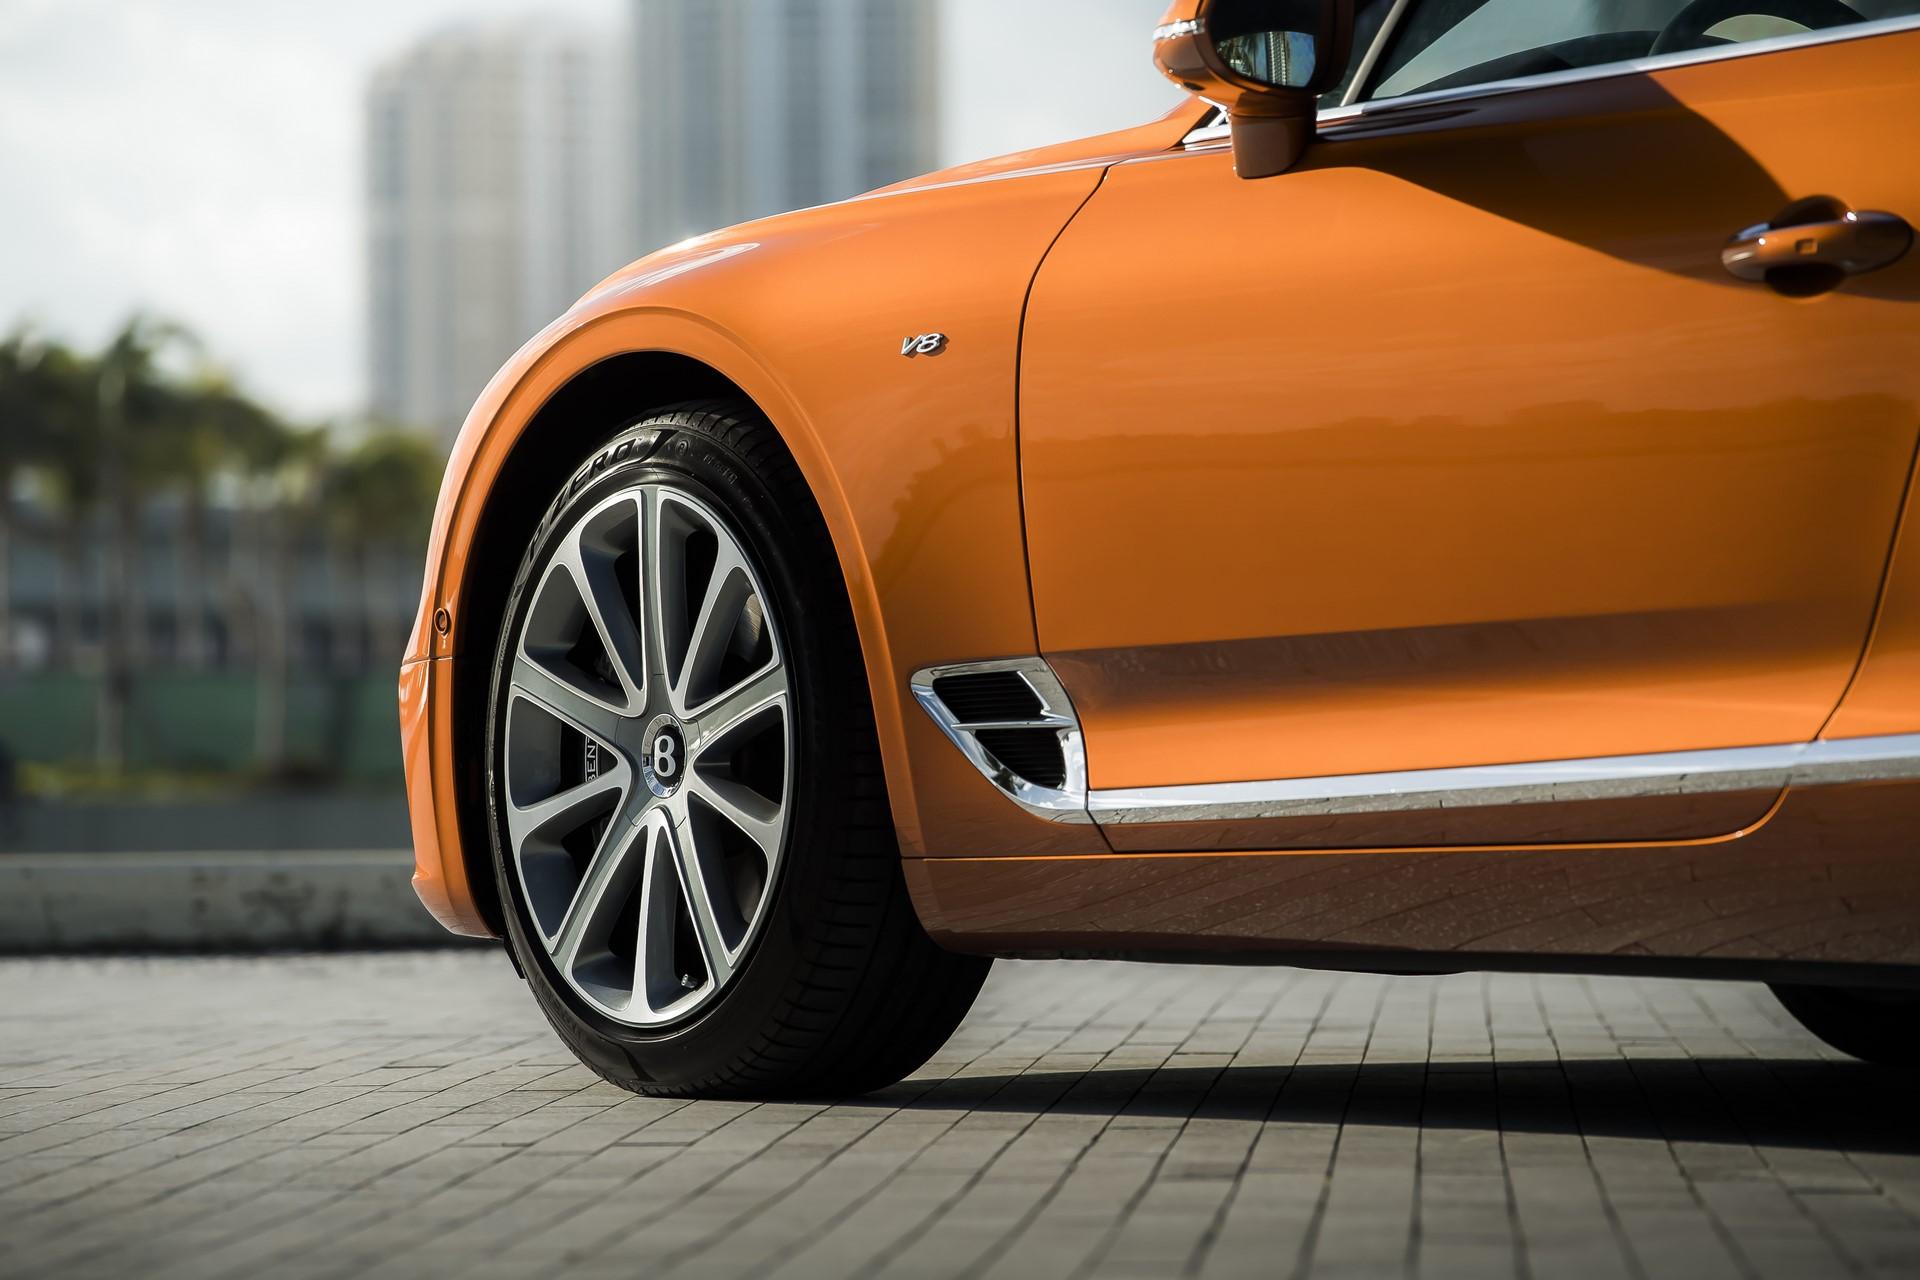 Bentley Continental V8  Photo: James Lipman / jameslipman.com